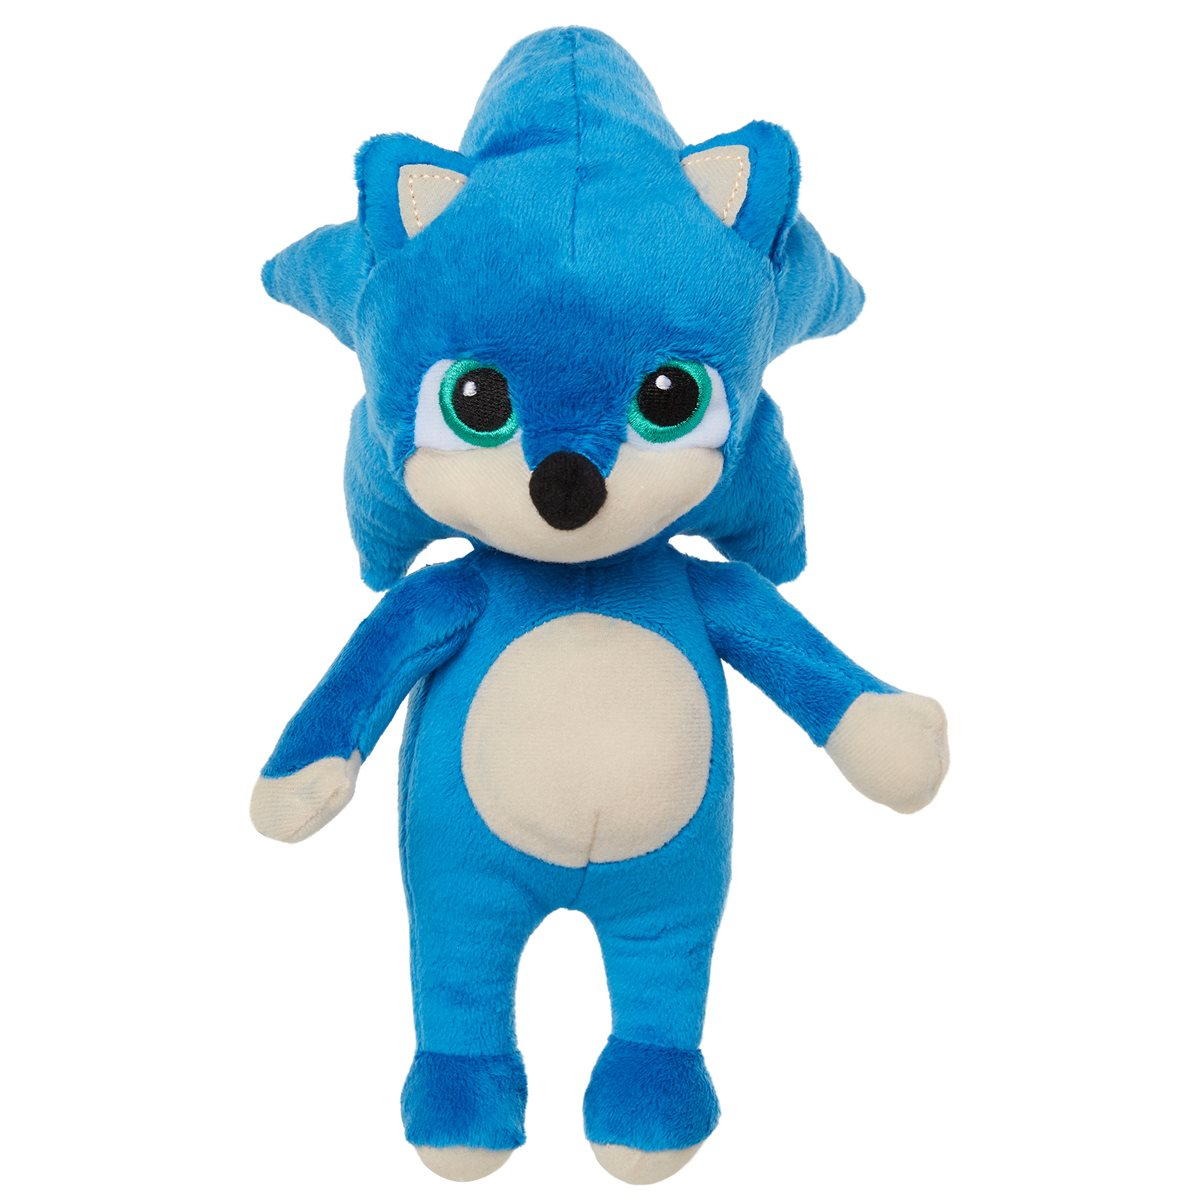 Sonic The Hedgehog Movie Baby Sonic 8 1 2 Inch Plush